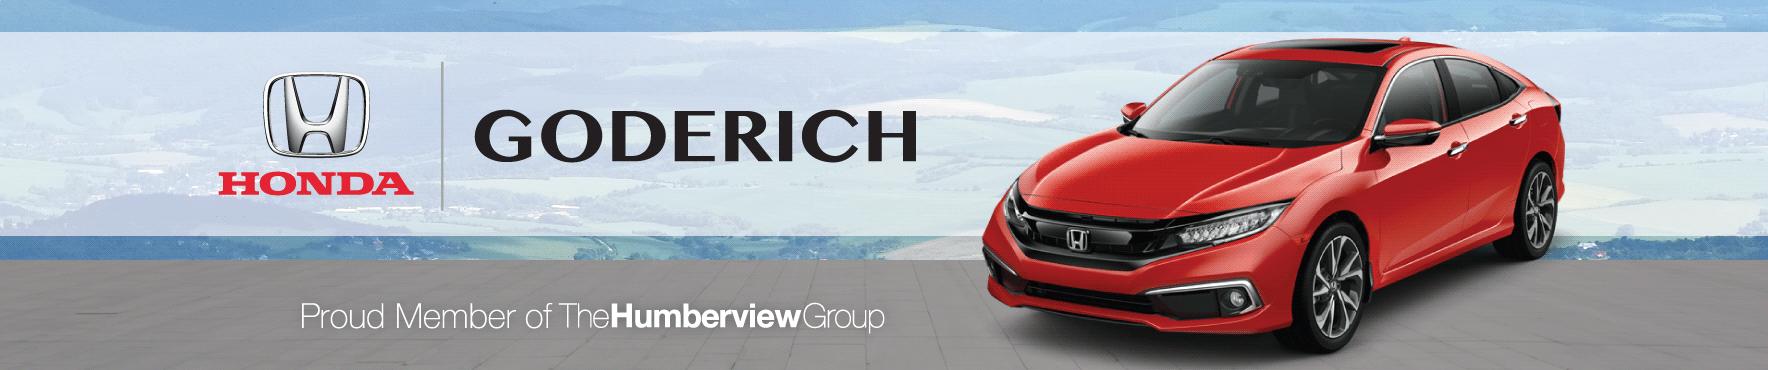 Goderich Honda - About Us